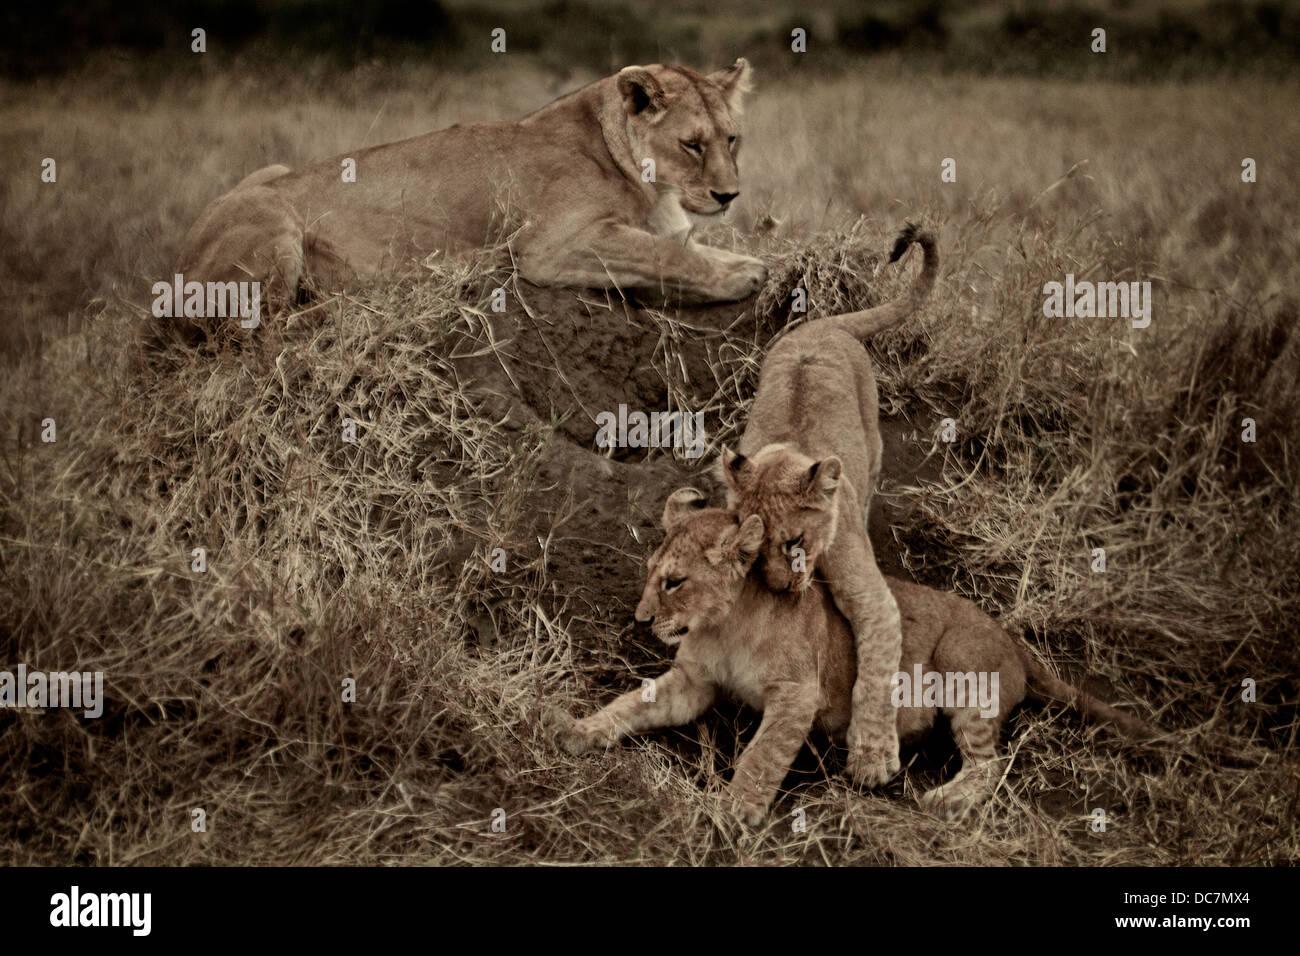 Hembra madre cuida a sus cachorros de león lucha . Serengeti . Tanzania, África. Imagen De Stock